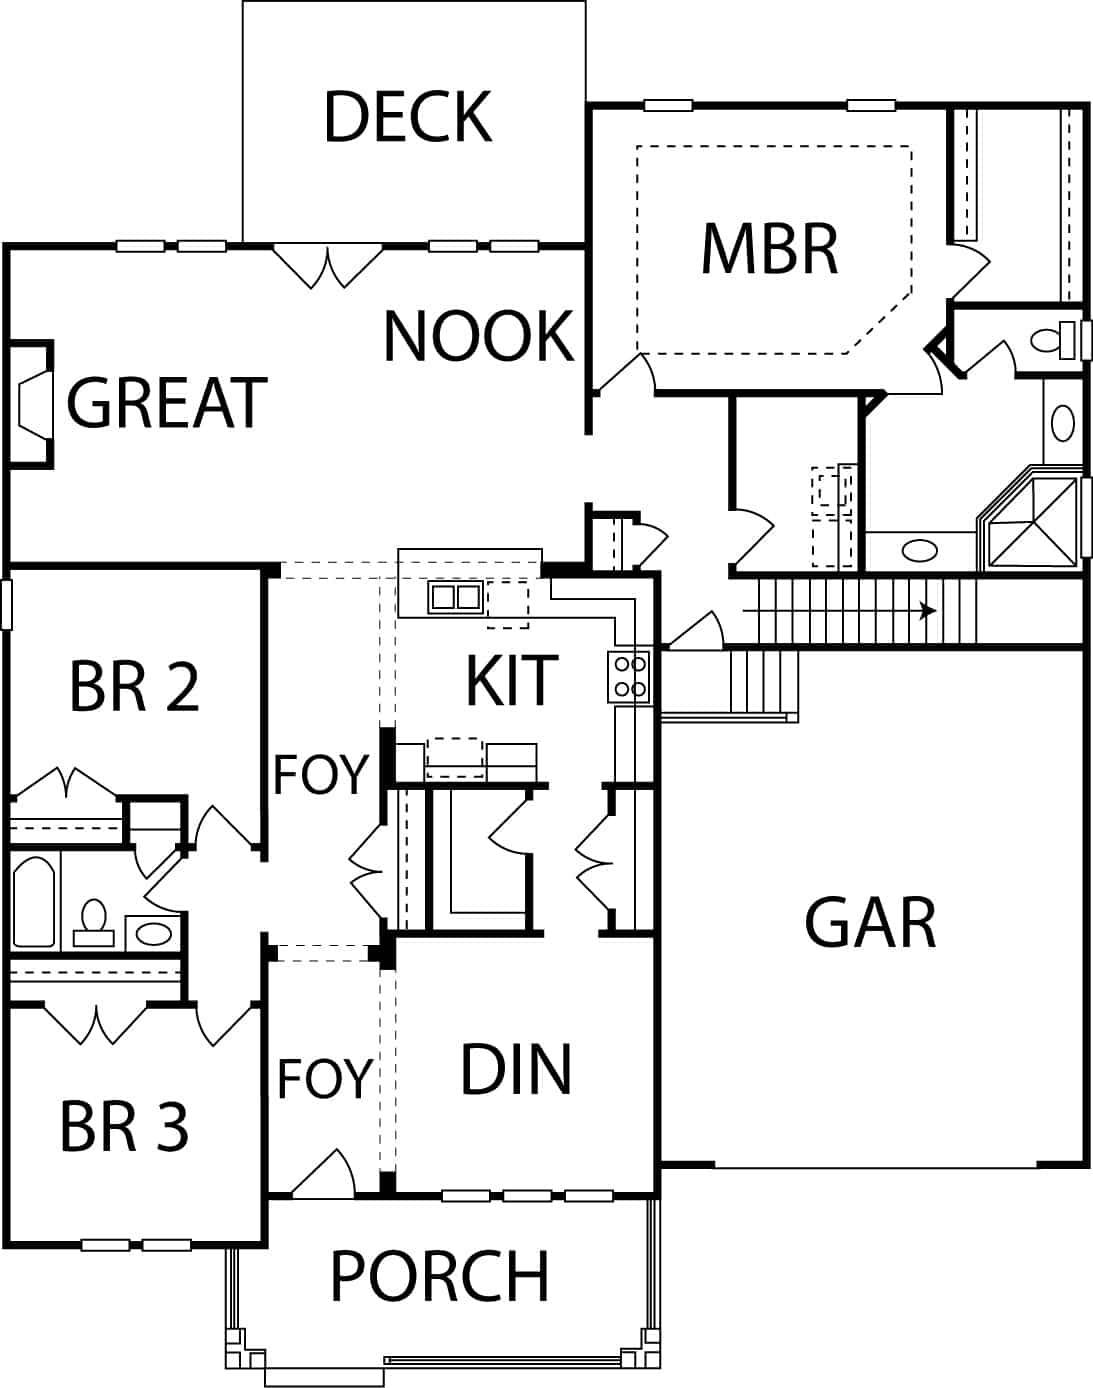 Biltmore design homes llc - Home design